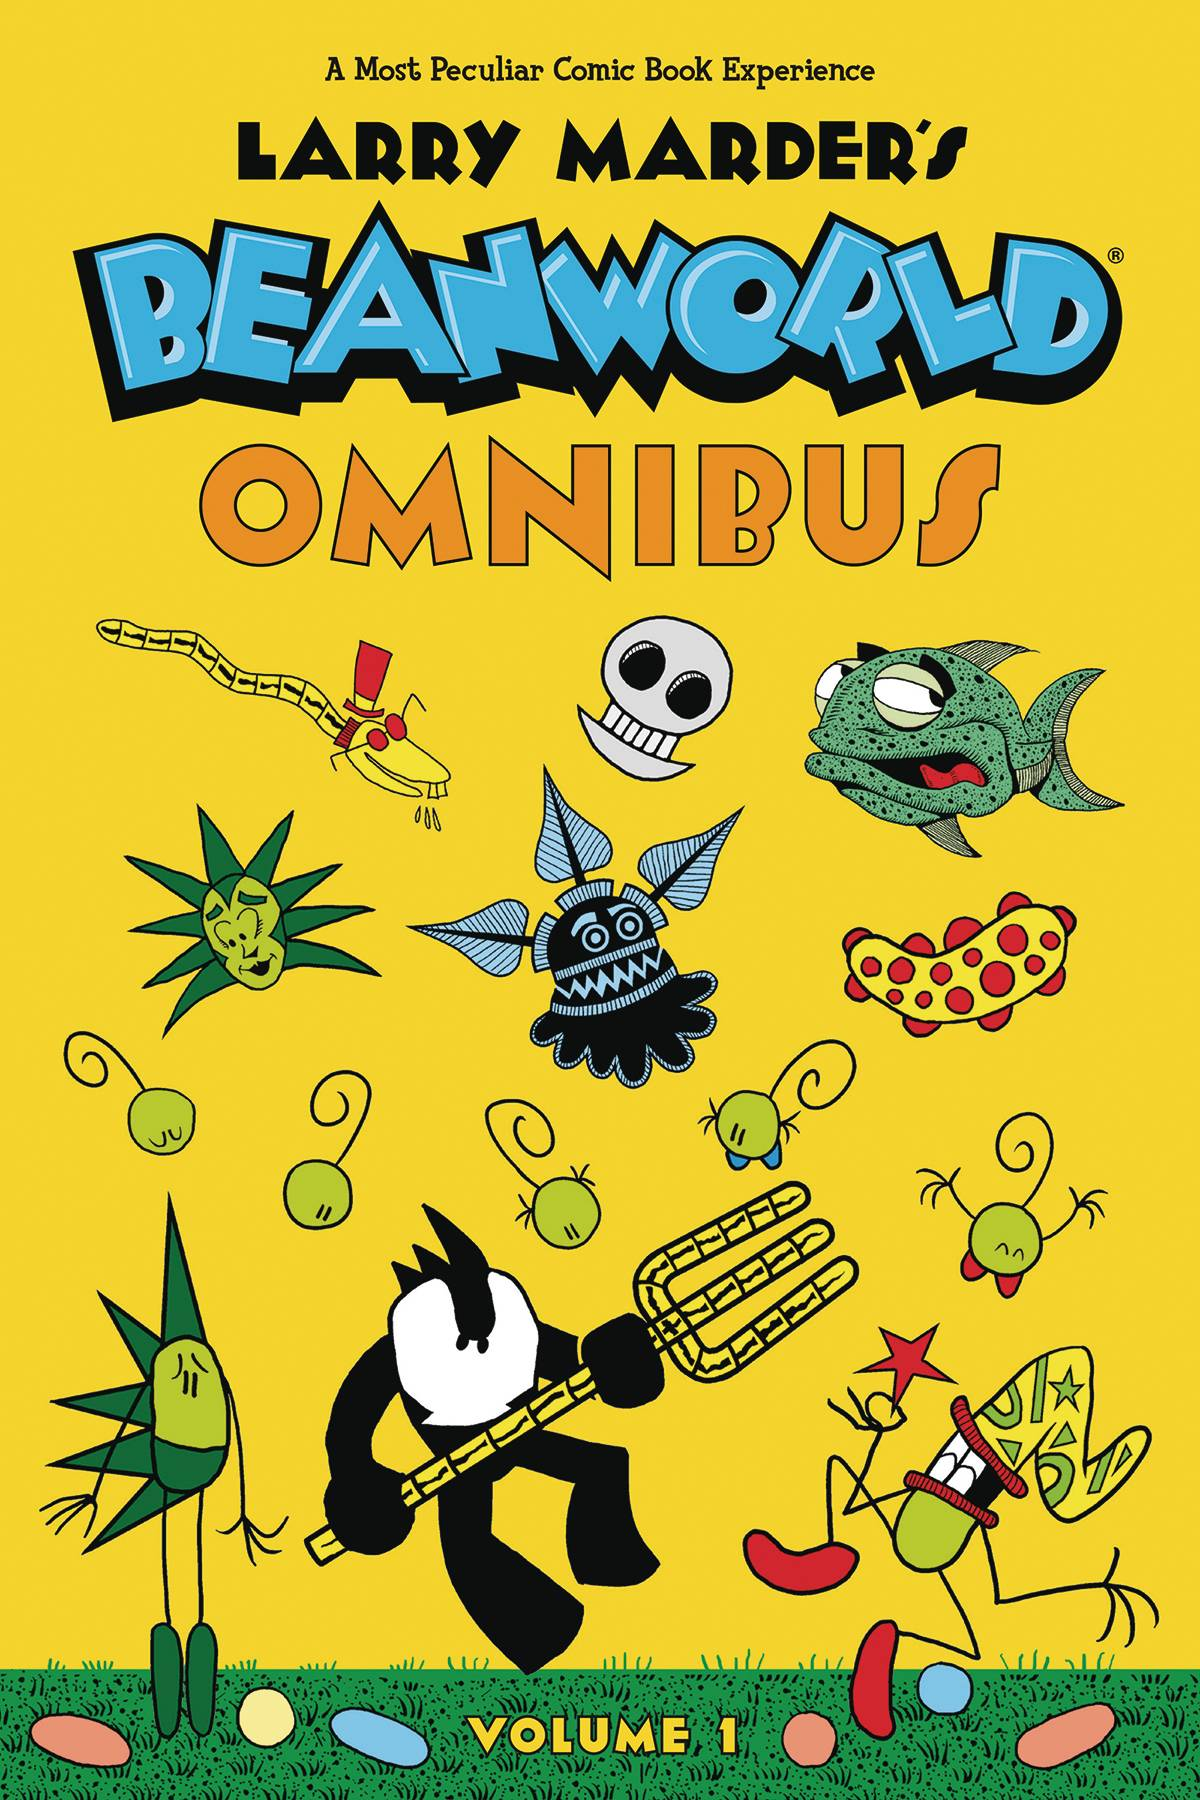 Beanworld Omnibus Vol 1 S C GBP22 99 Dark Horse By Larry Marder